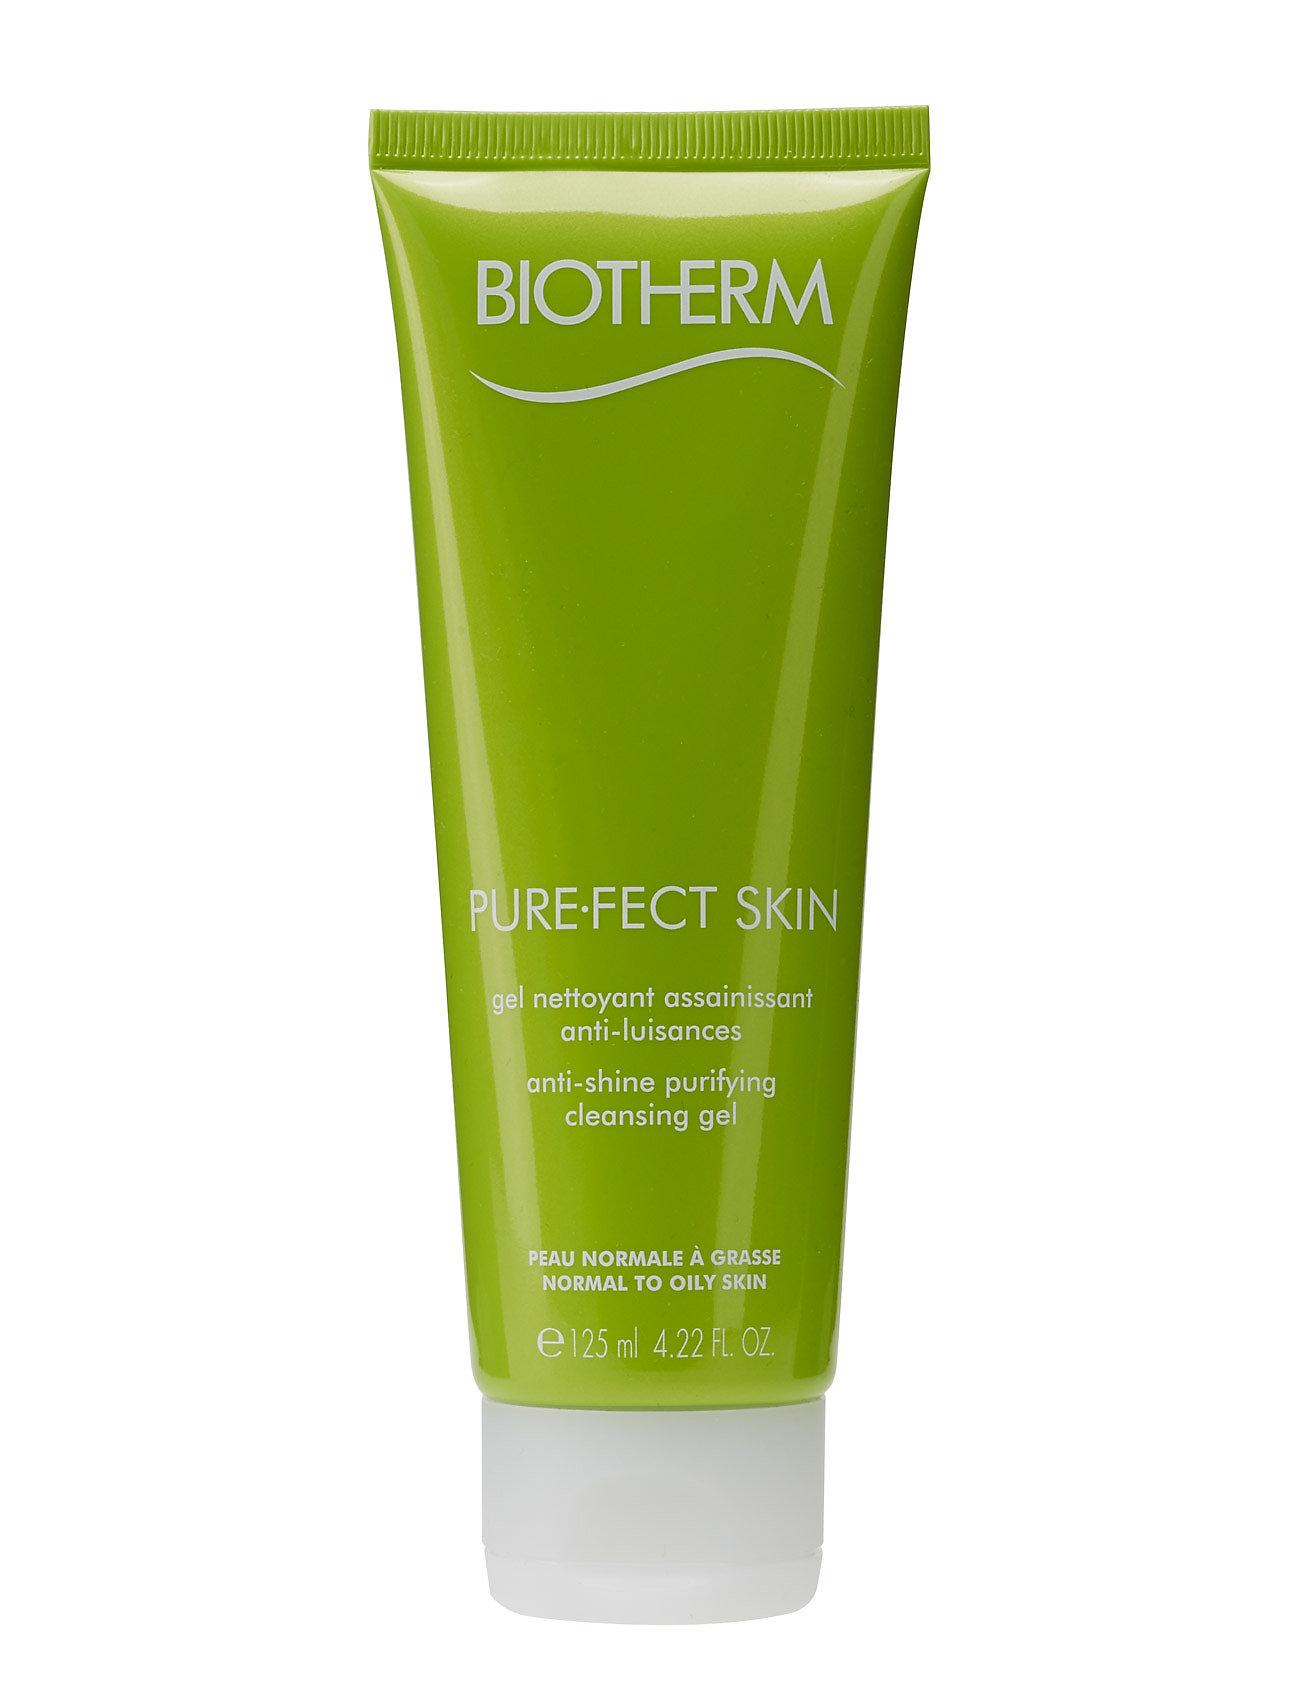 biotherm Pure-fect skin cleanser 125 ml fra boozt.com dk